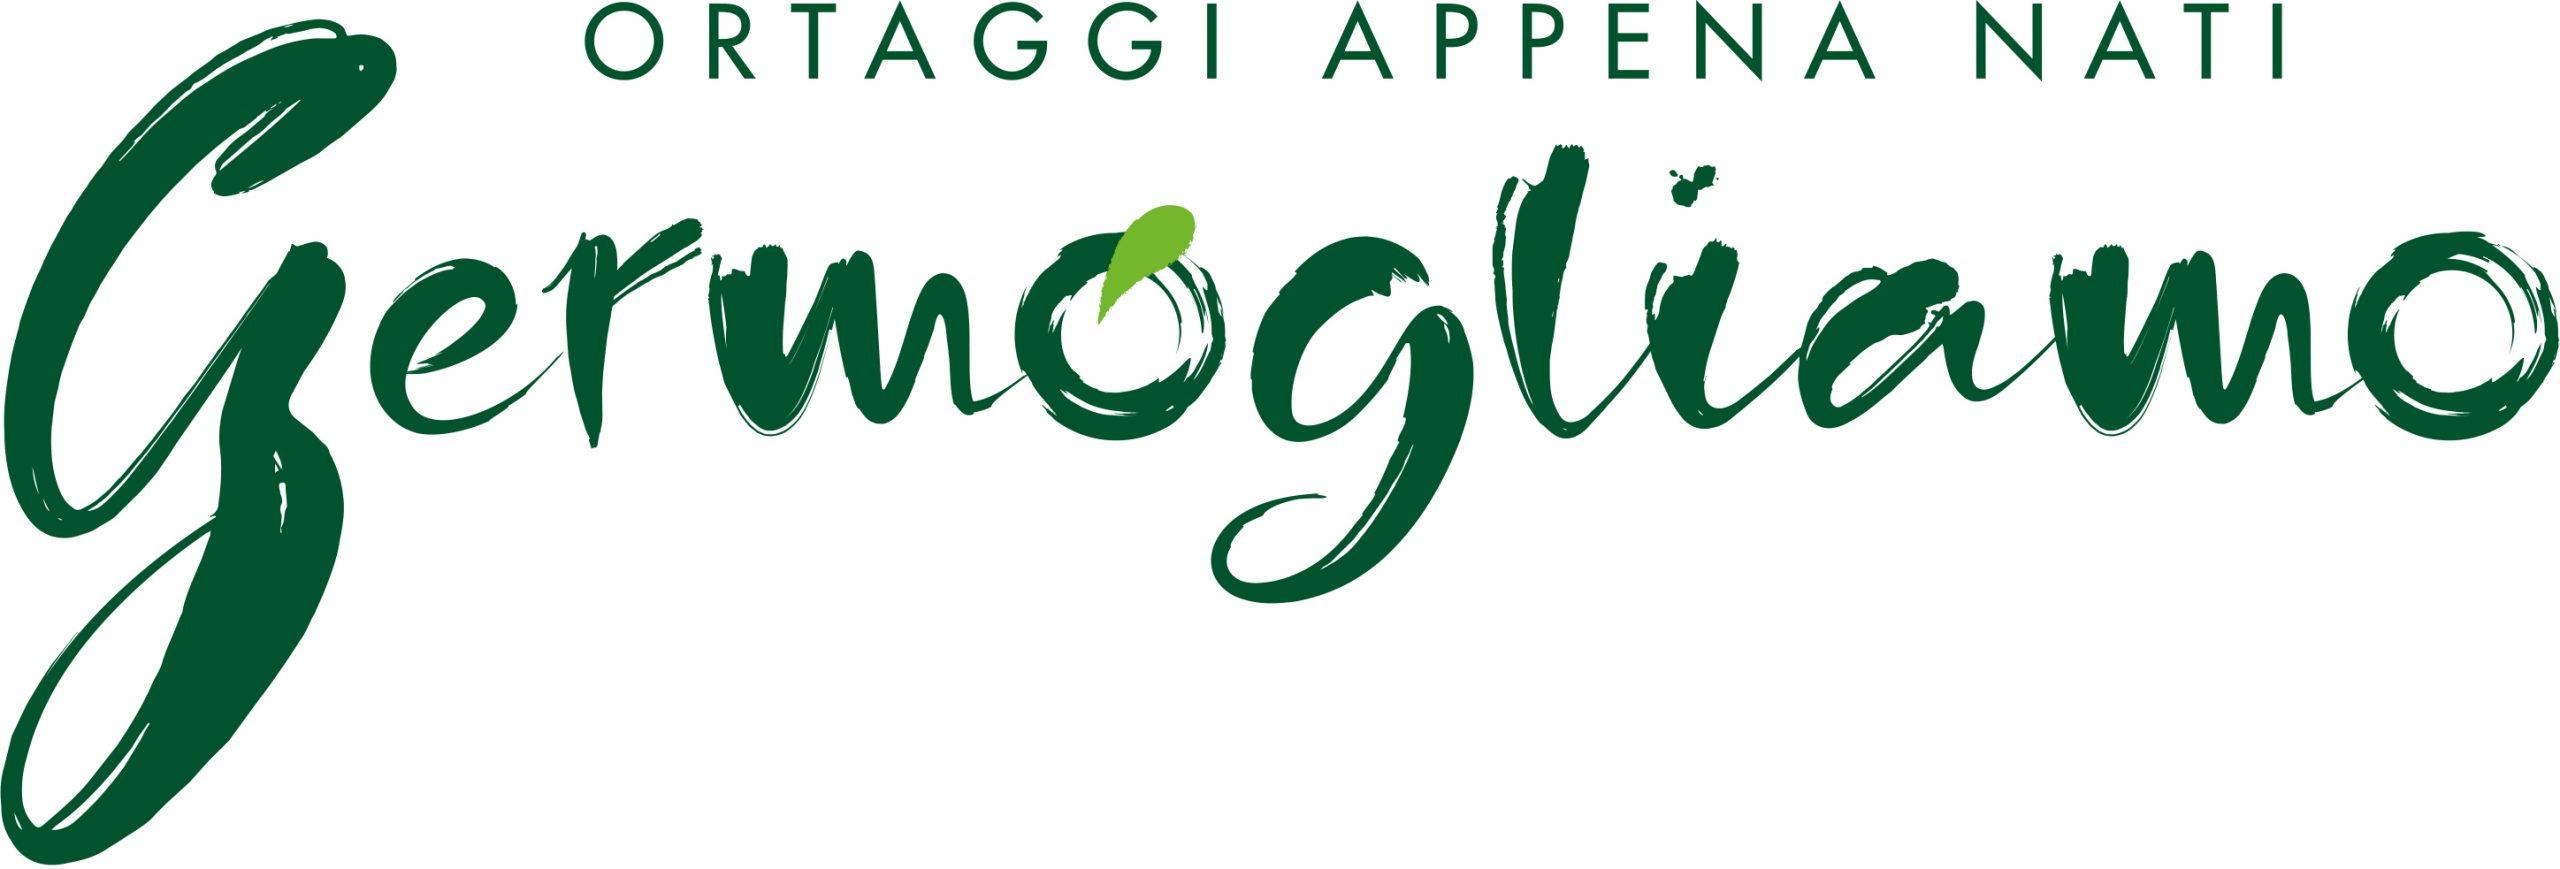 Germogliamo logo